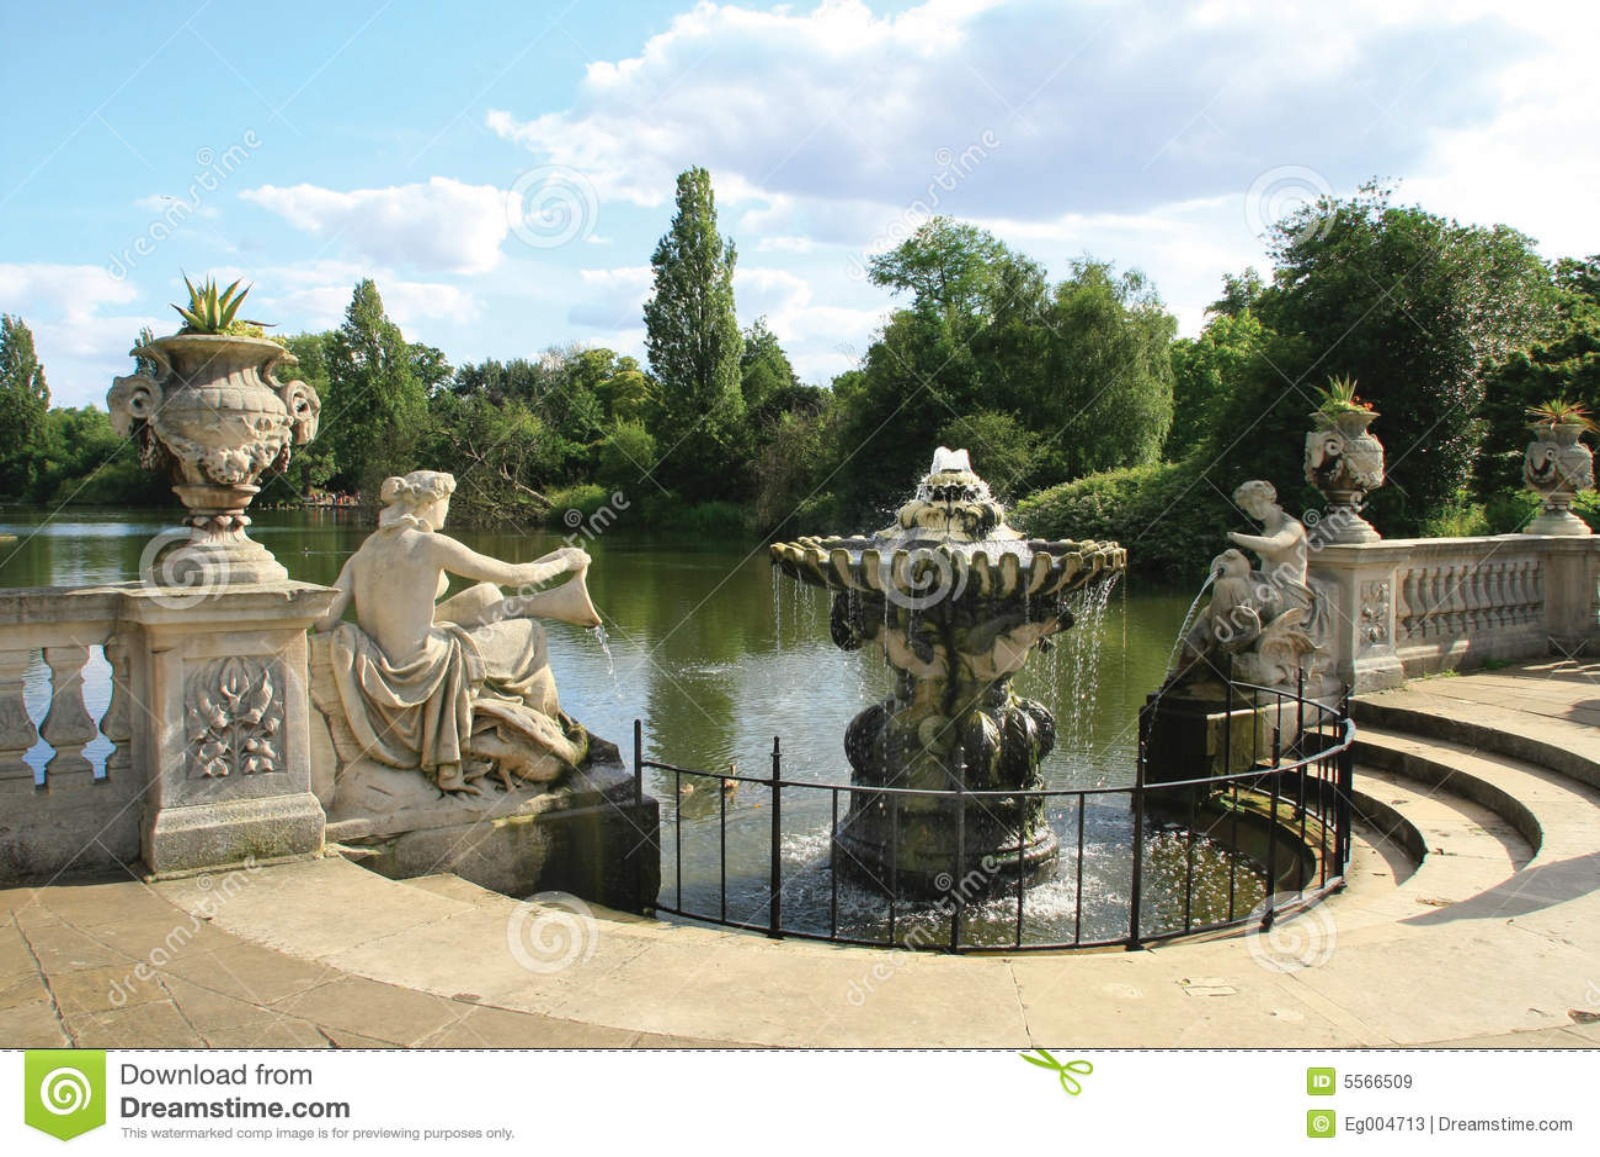 Jardin italien aux jardins de kensington image stock for Jardines de kensington